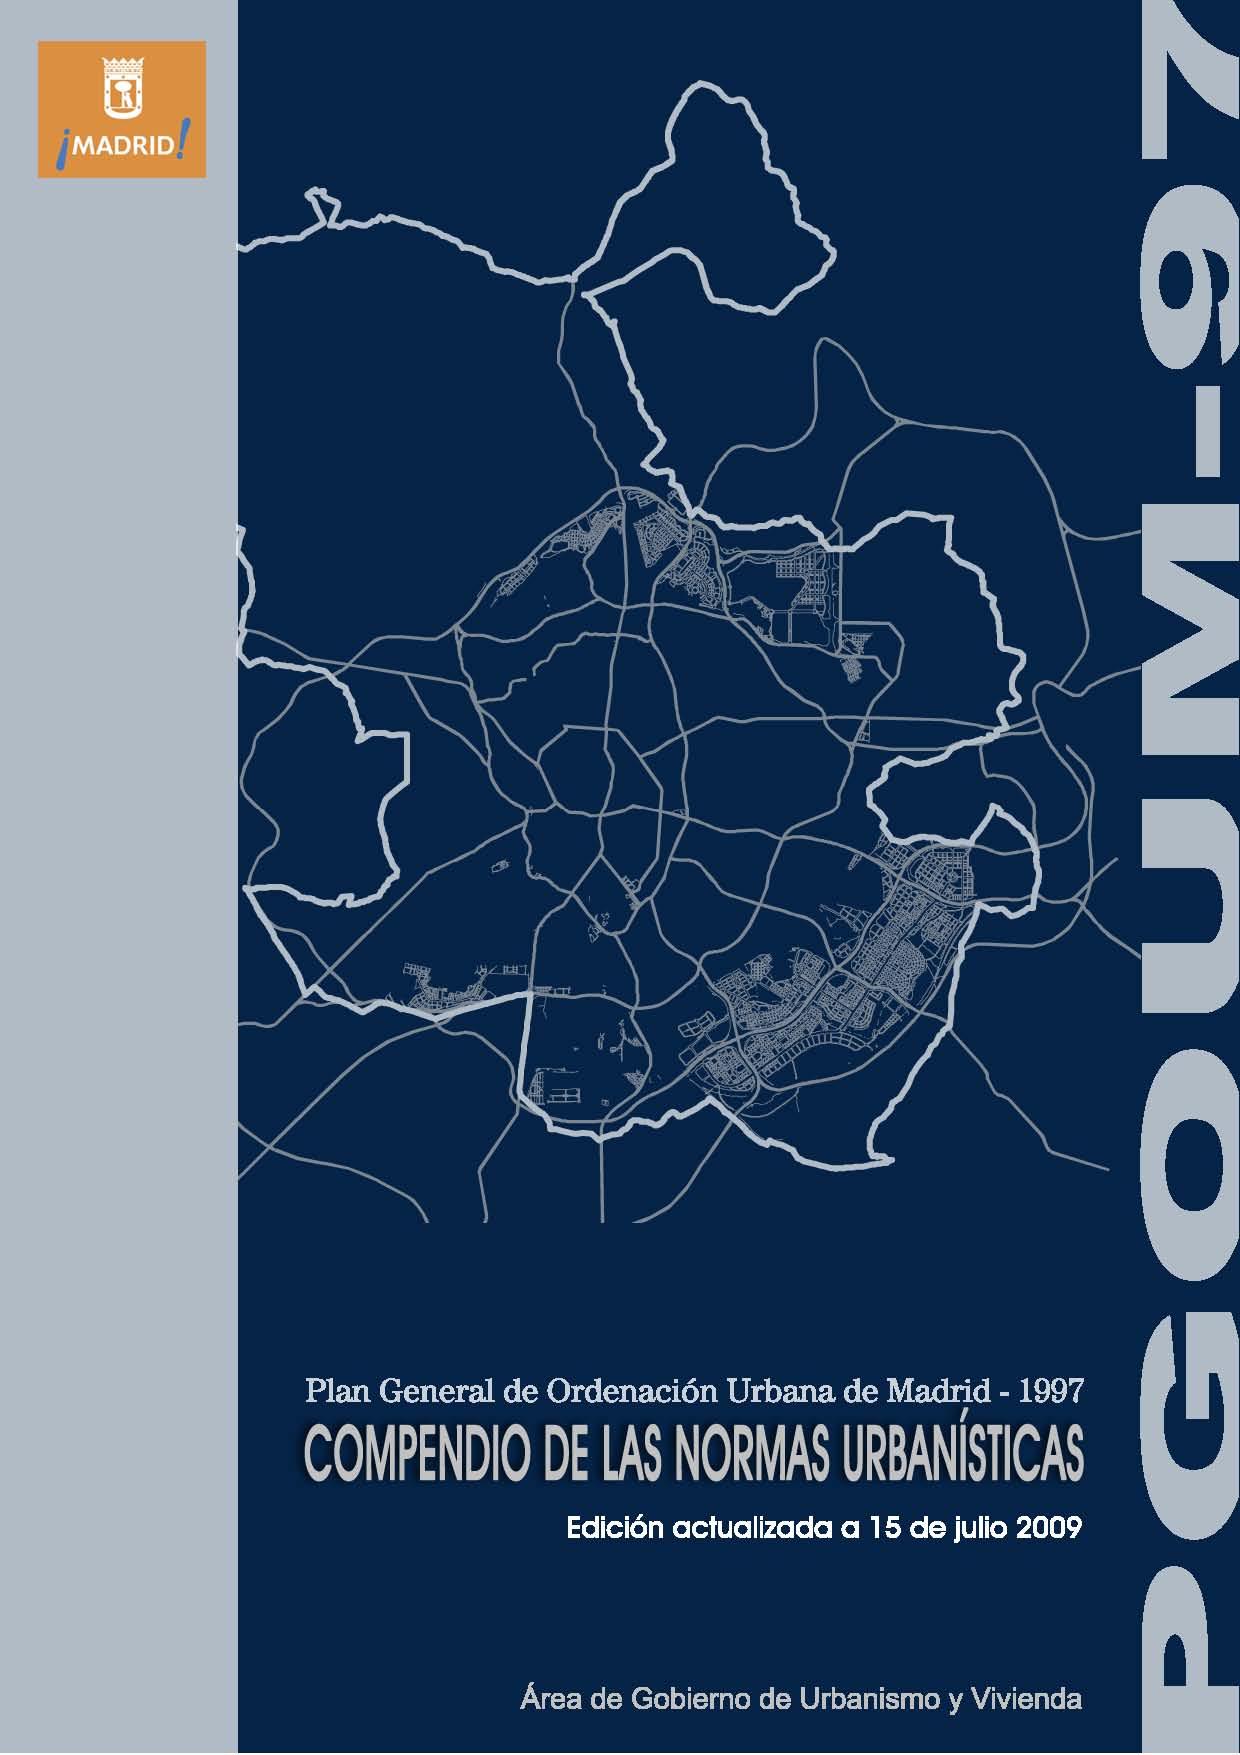 Niveles de protección edificios catalogados de Madrid.